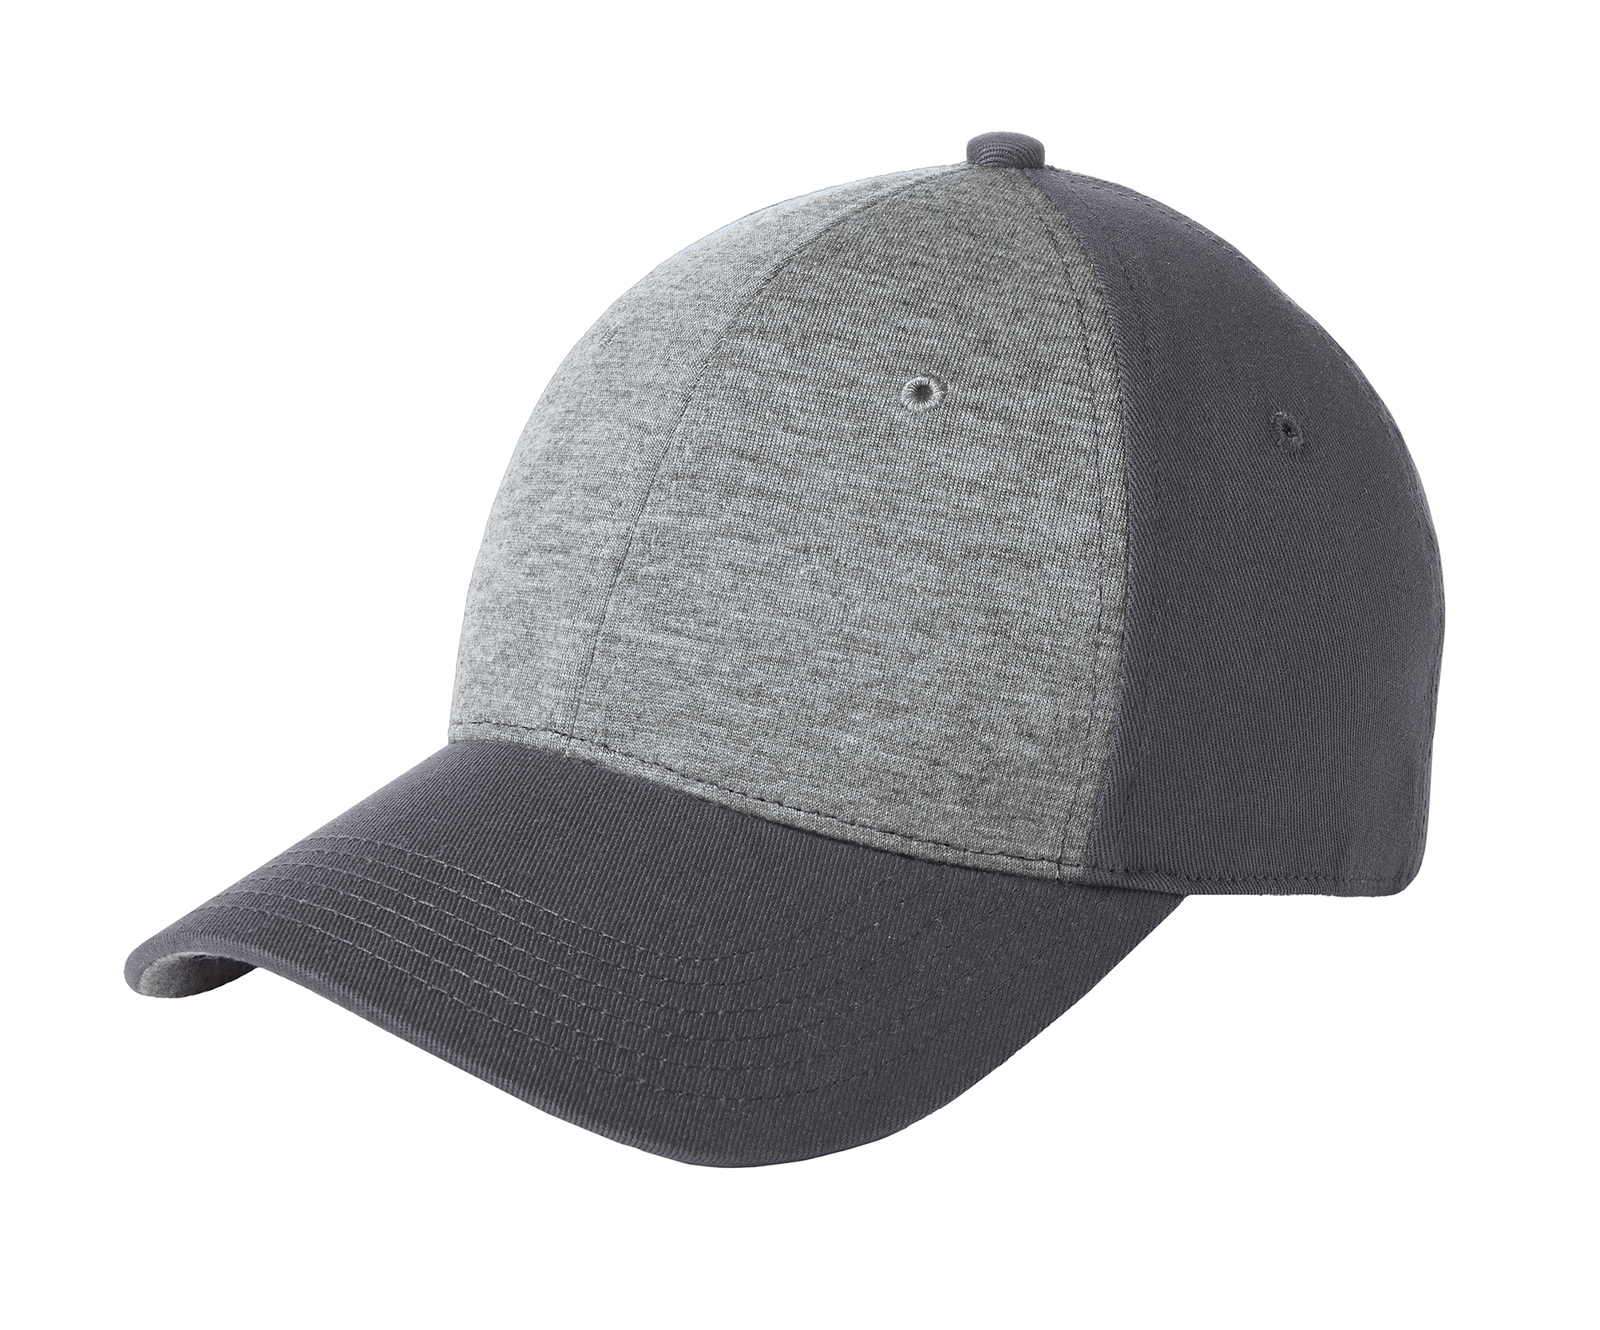 Sport-Tek Embroidered Jersey Front Hat